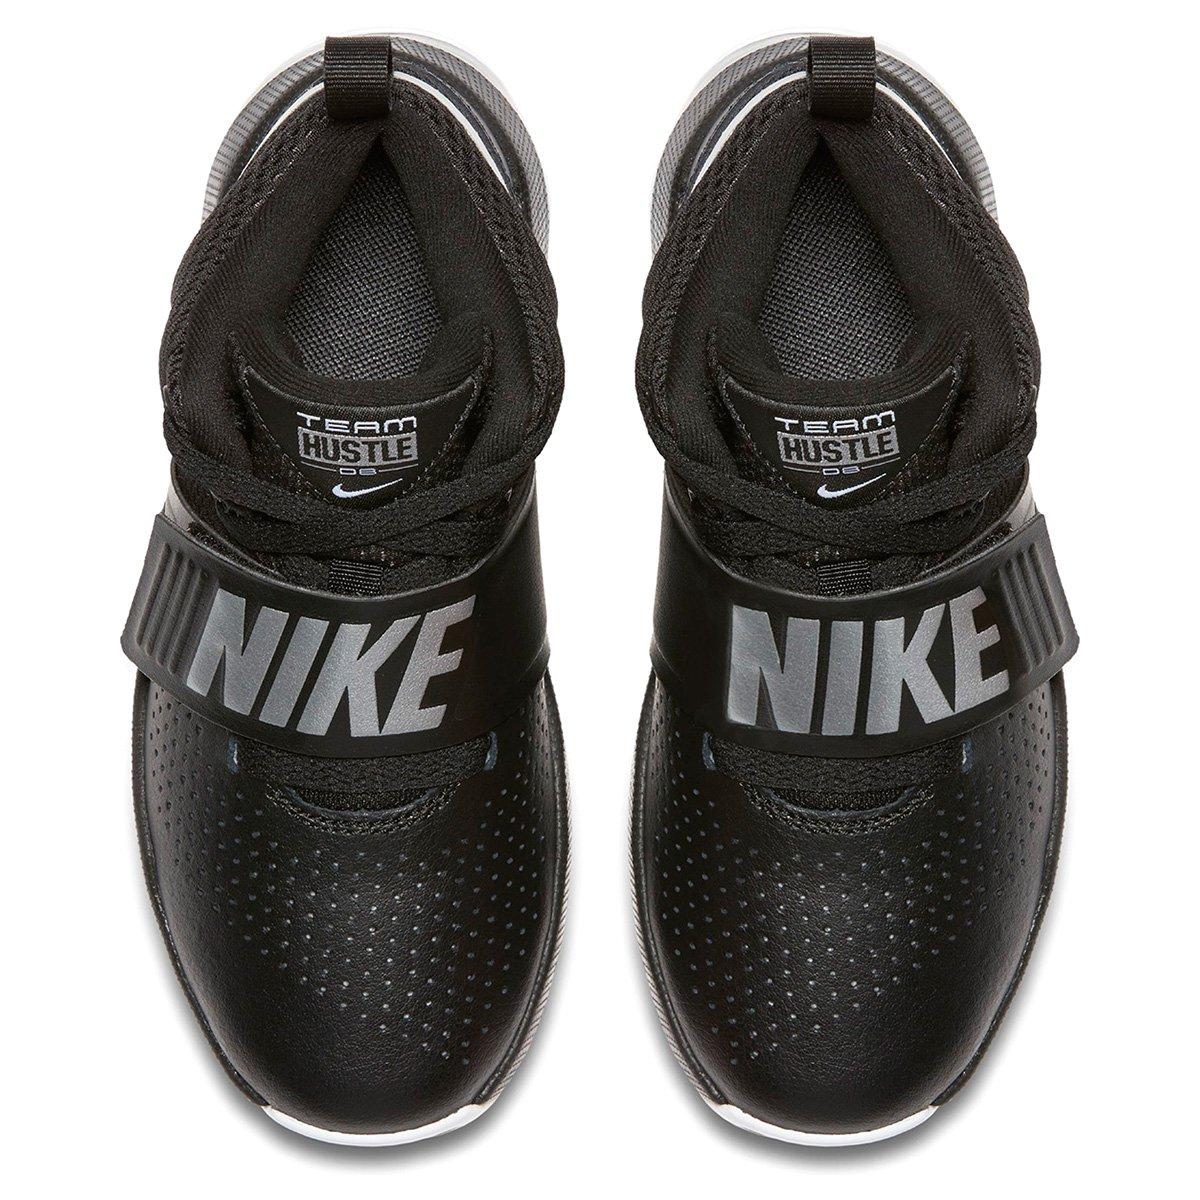 a8fc0018f0 Tênis Infantil Nike Team Hustle D 8 Masculino